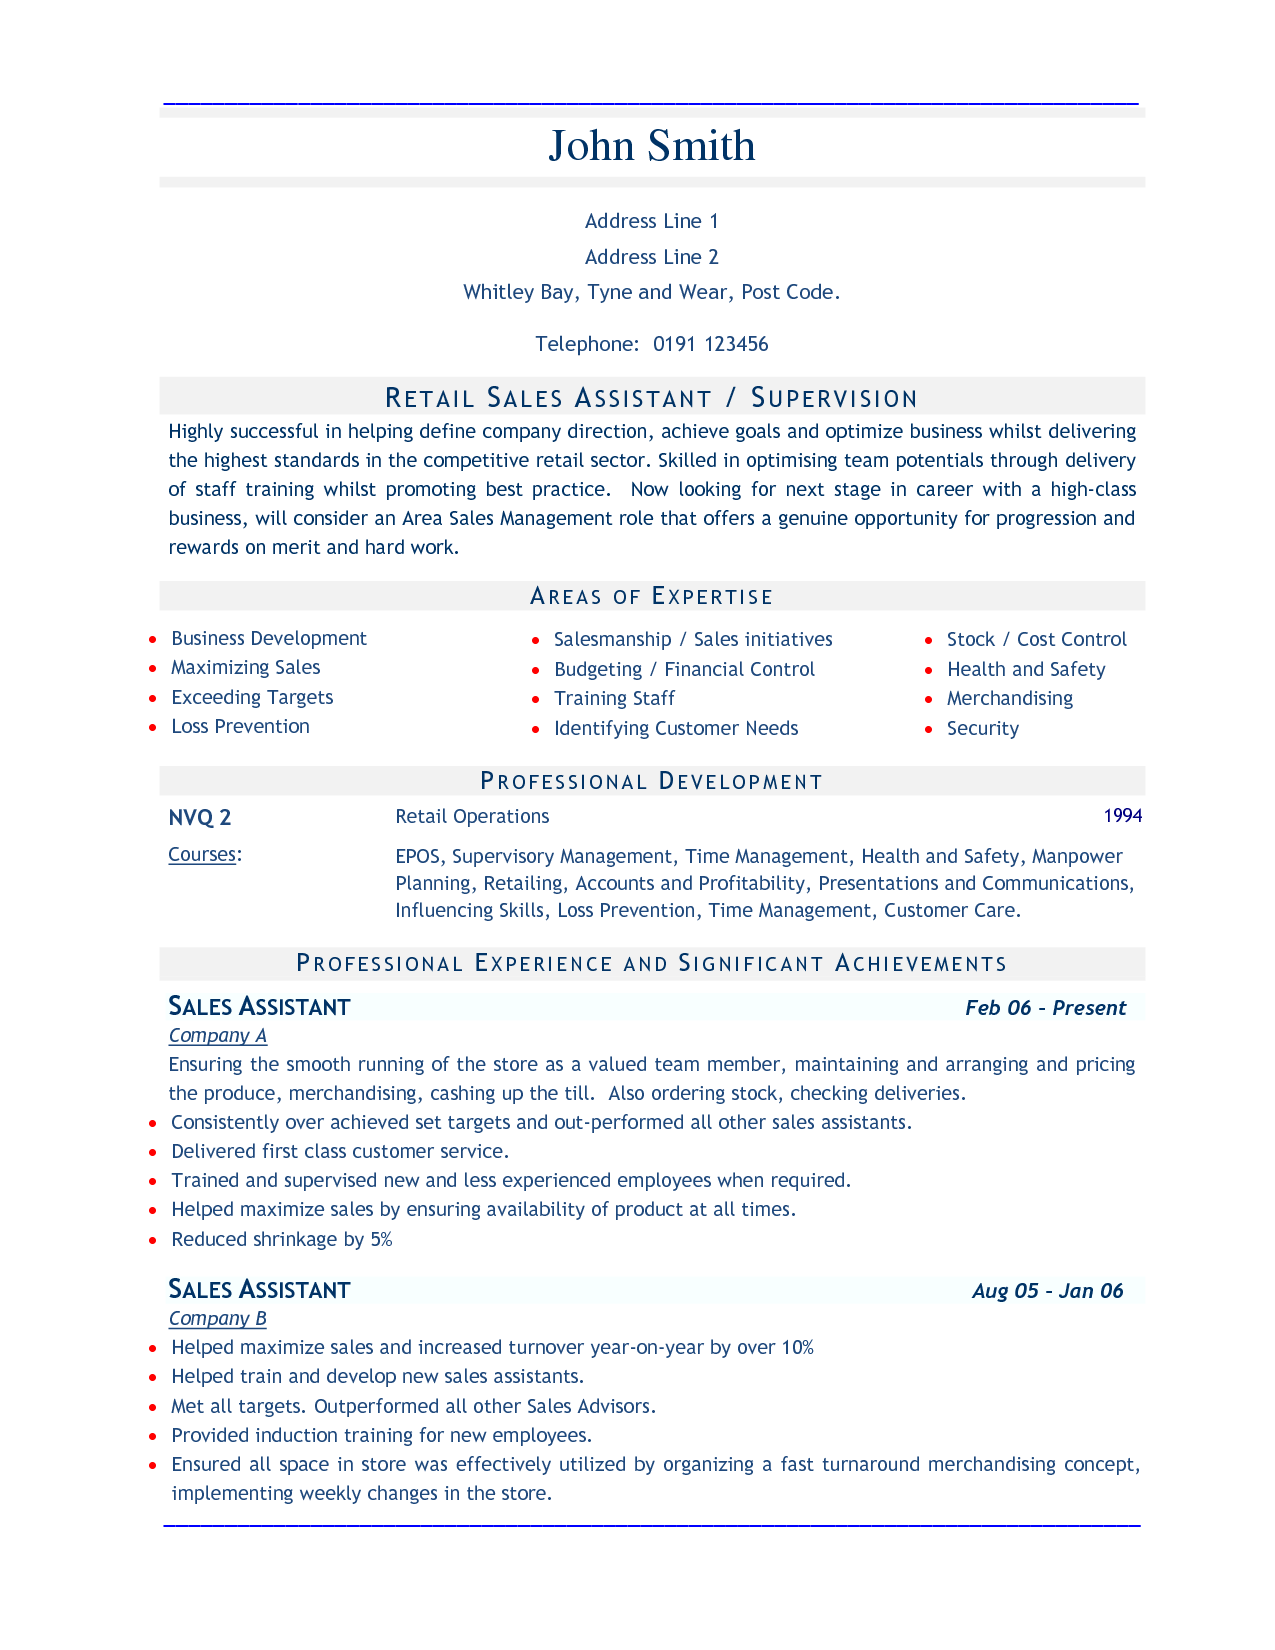 retail sales resume sales assistant 3 Sample resume